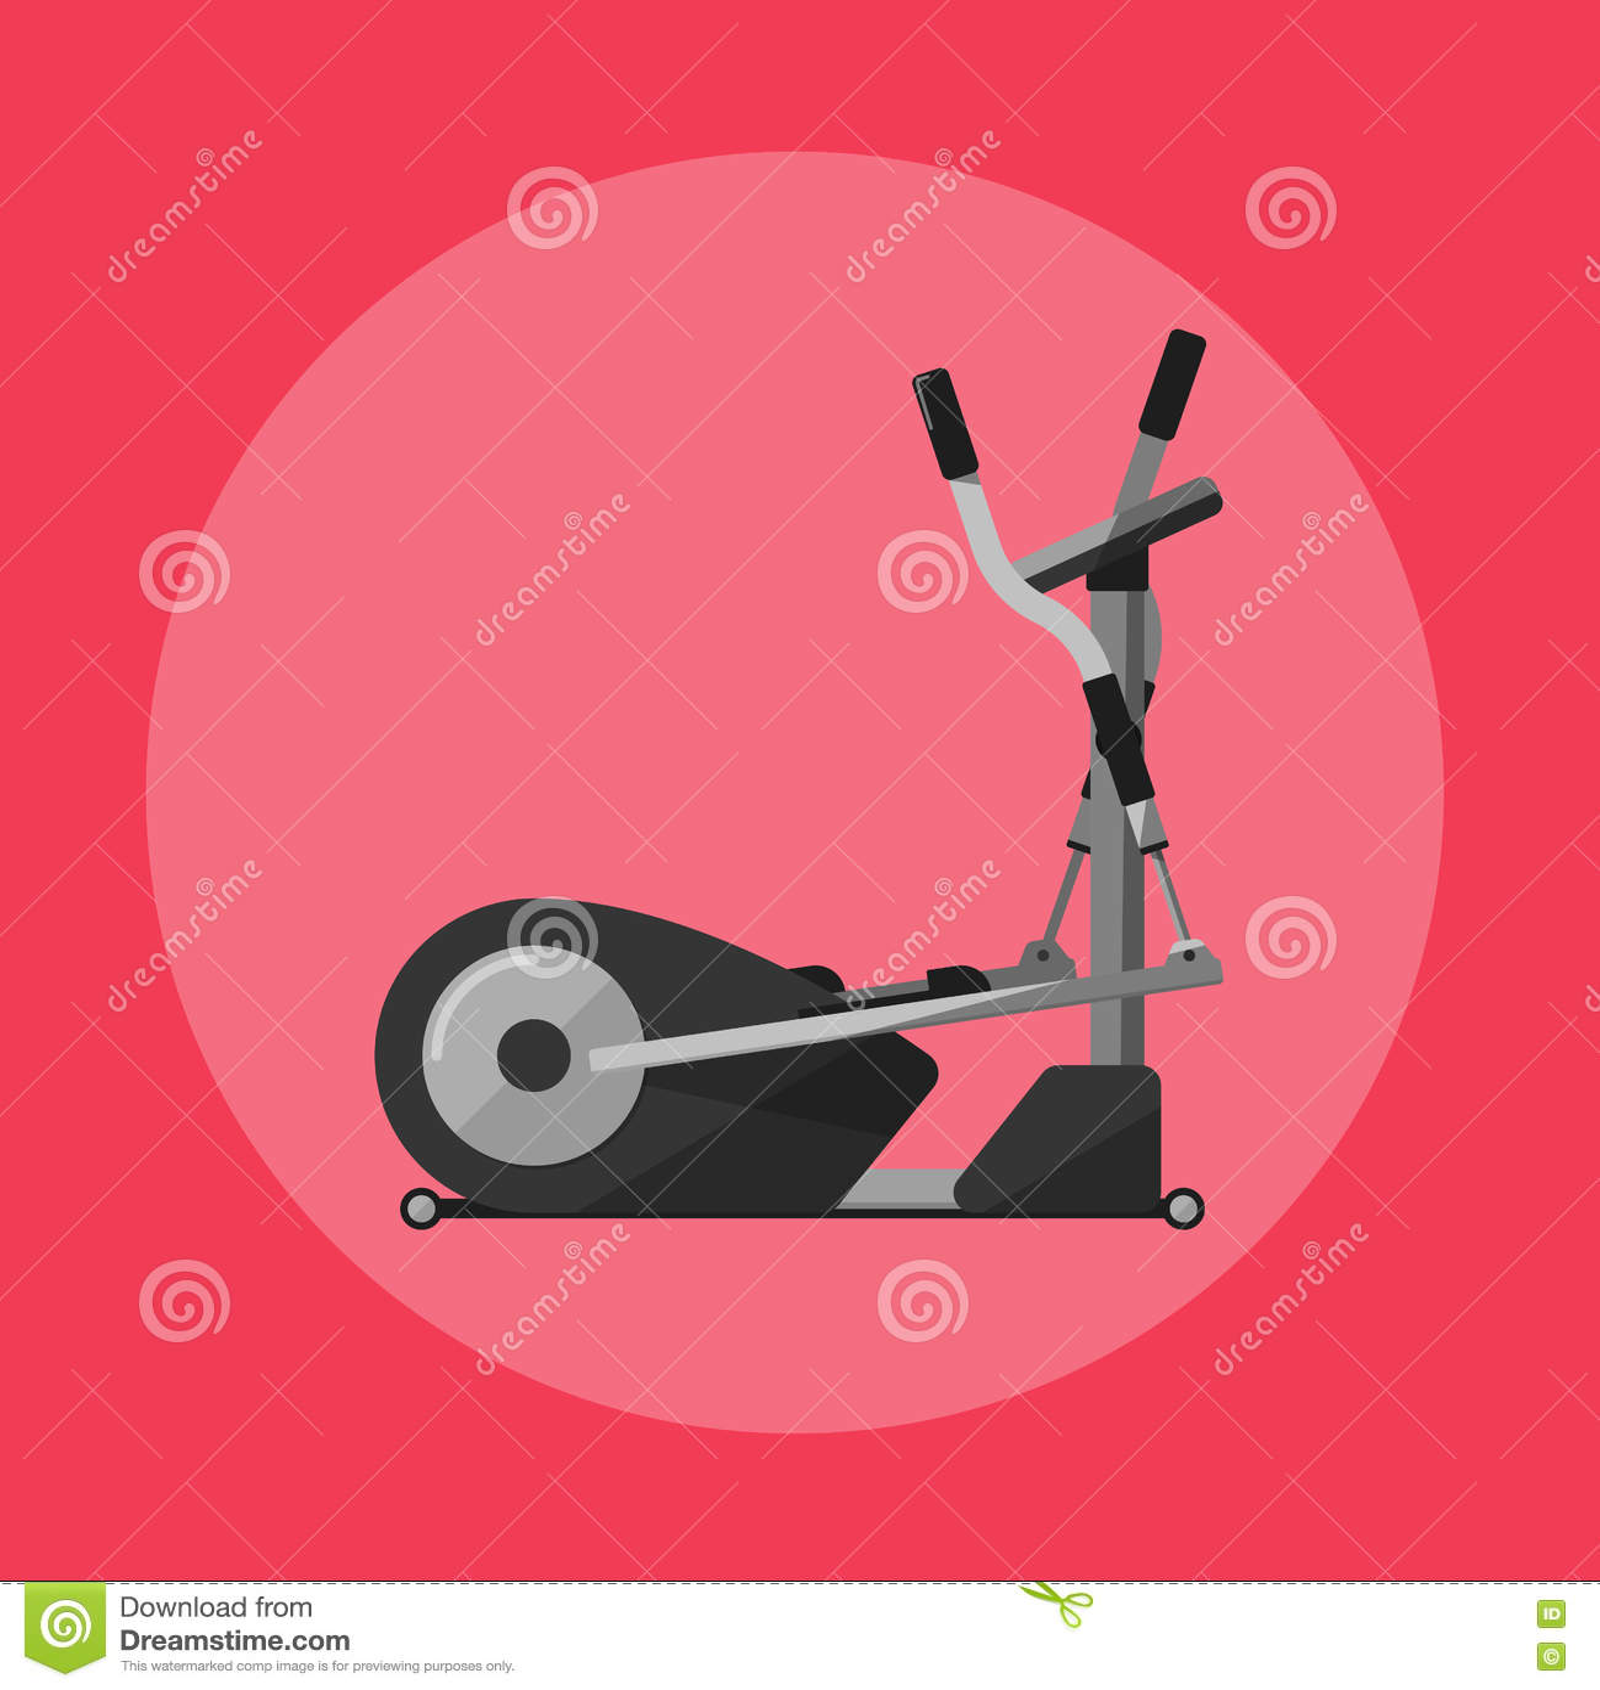 Elliptical Cross Trainer  Gym Sports Equipment Stock Vector